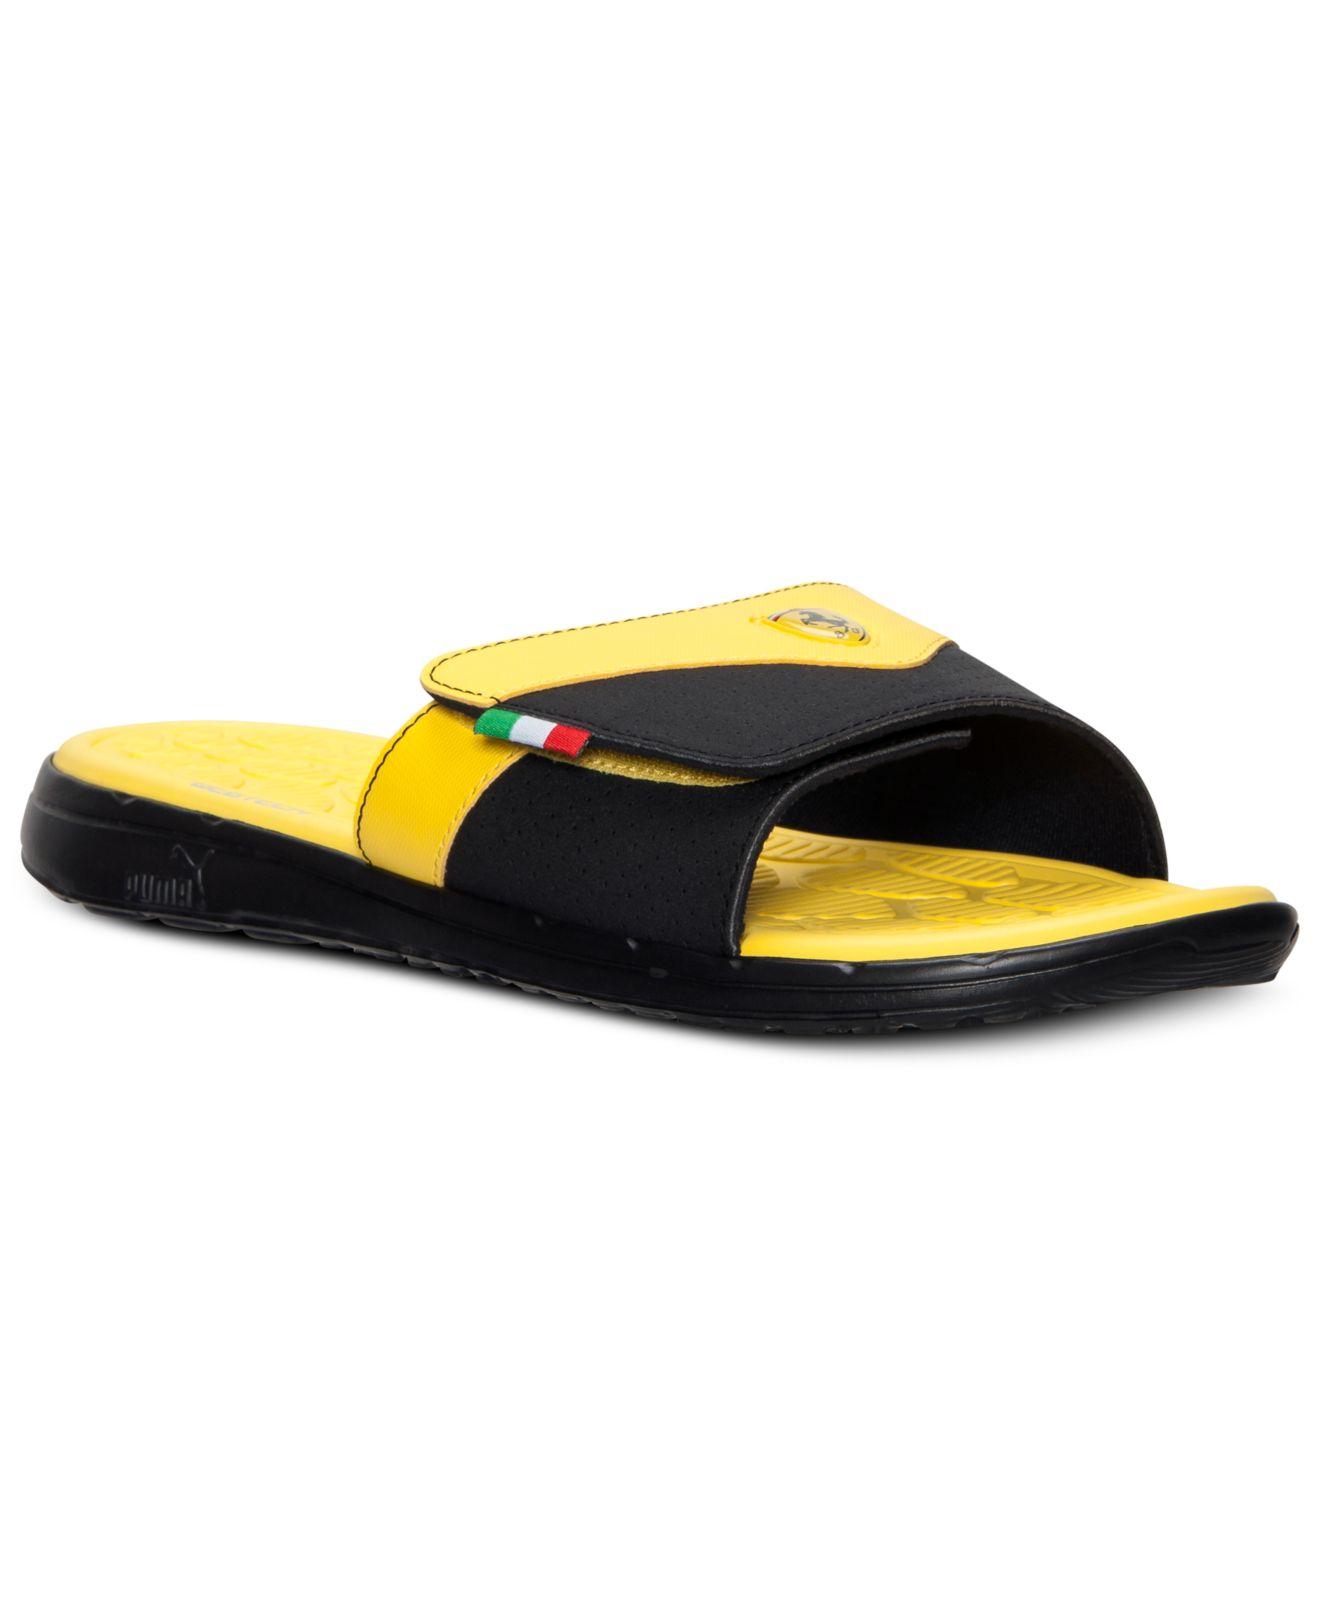 Lyst - PUMA Men S Ferrari Slide Sandals From Finish Line in Yellow ... b243d9069